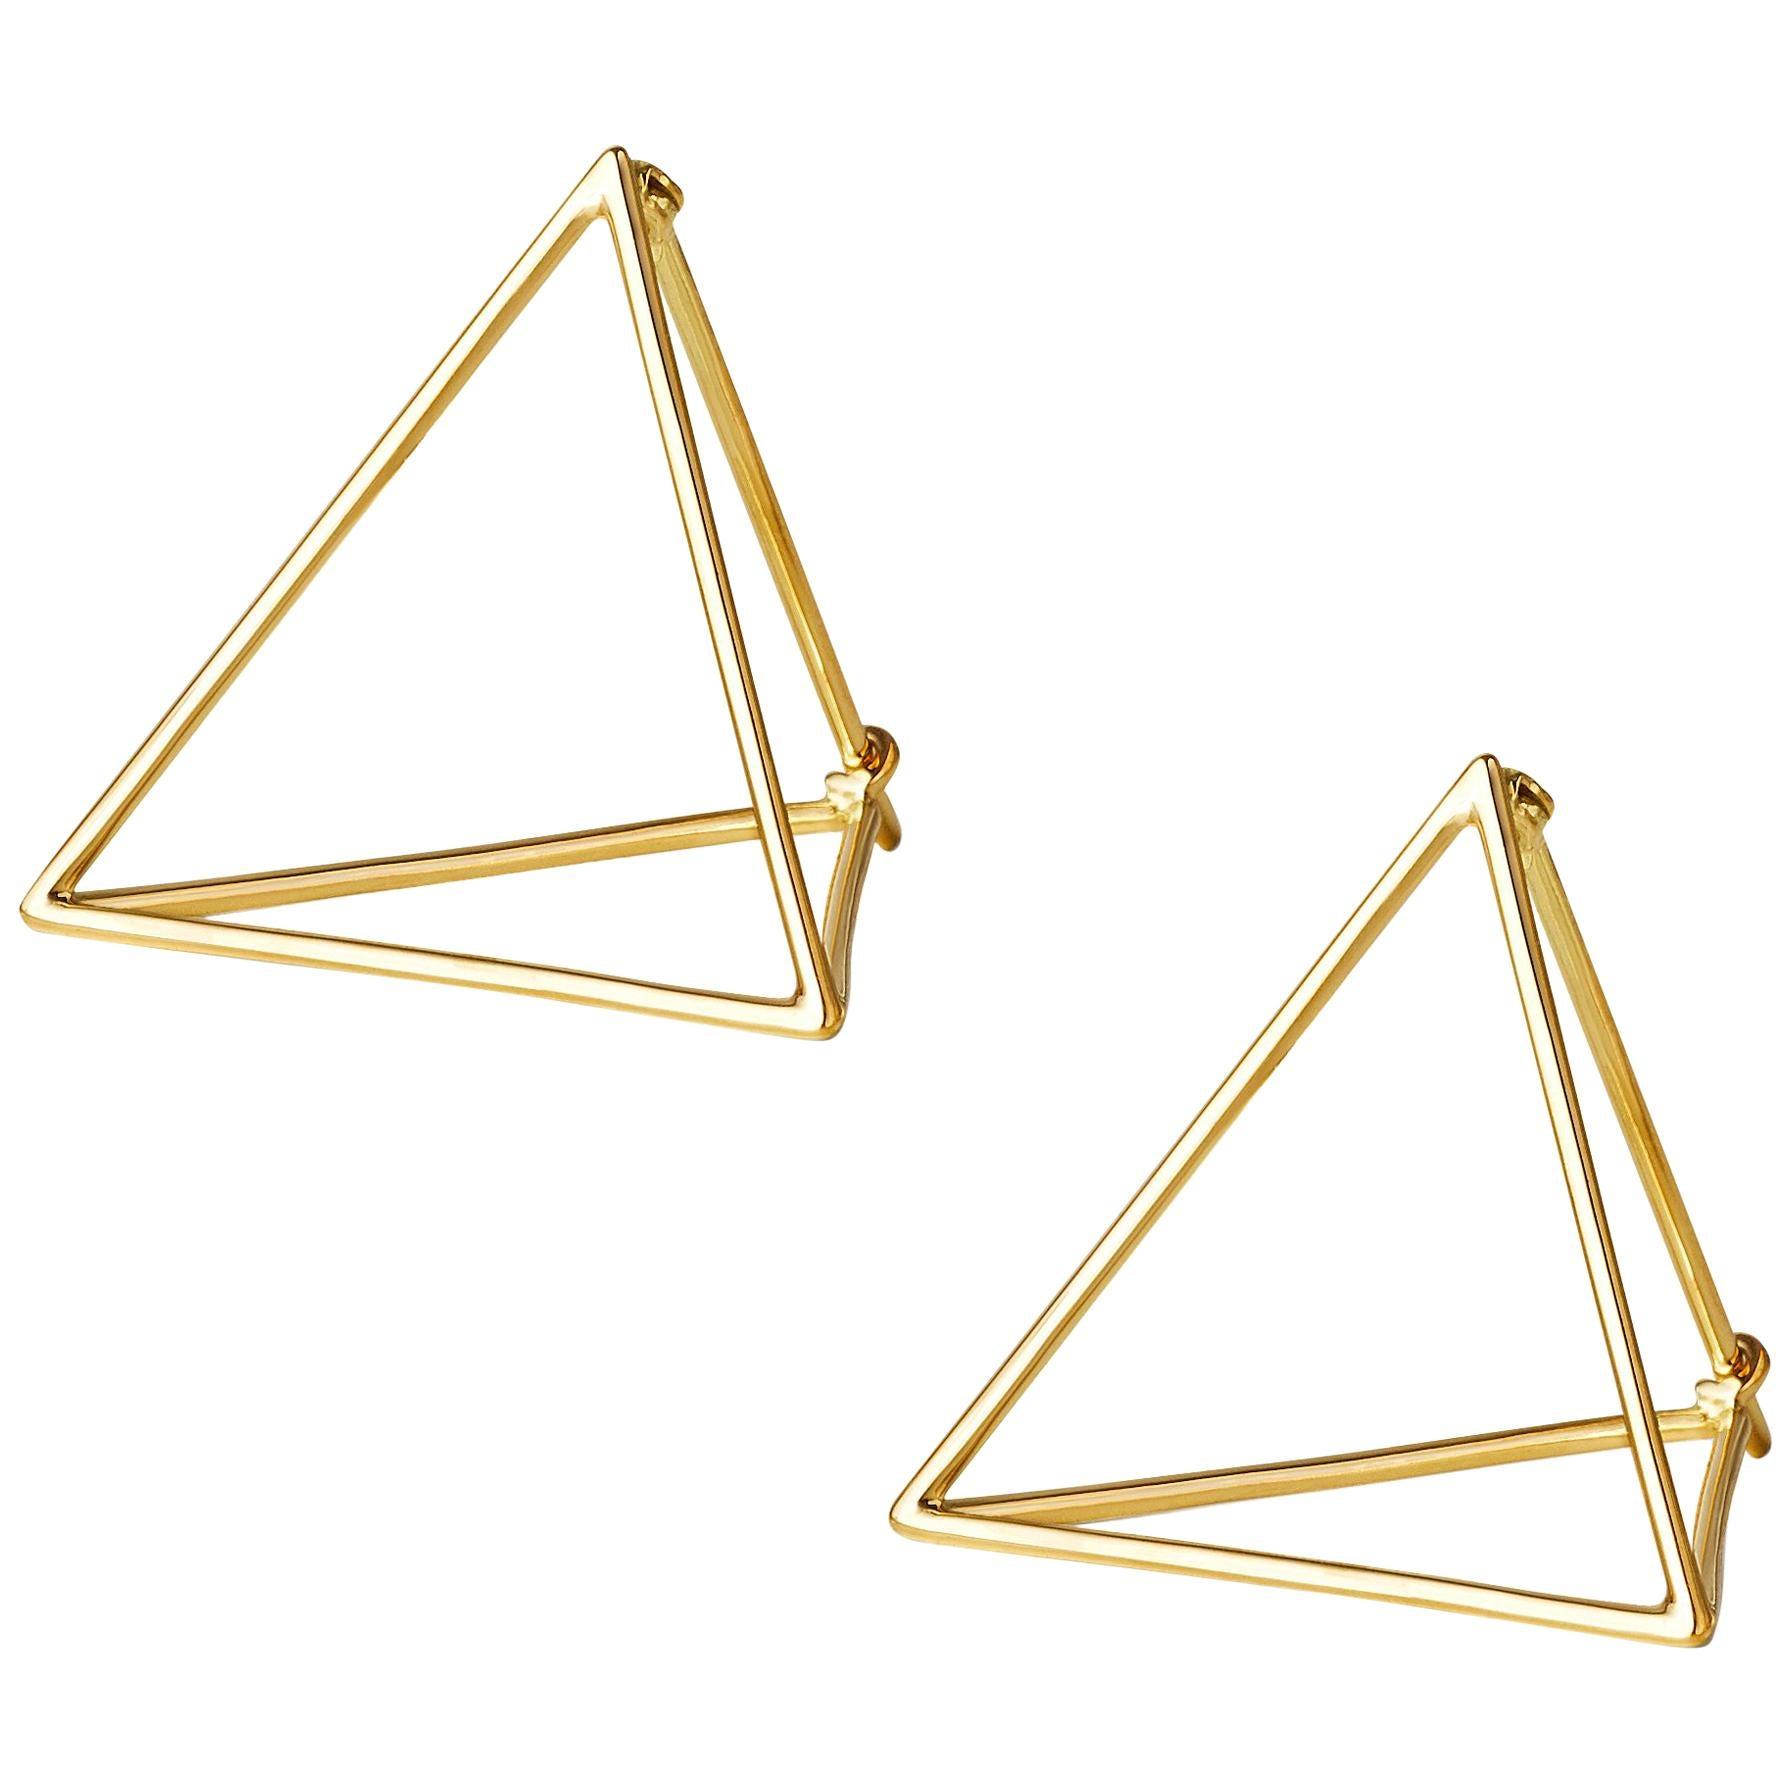 18 Karat Yellow Gold Triangle Pair of Earrings